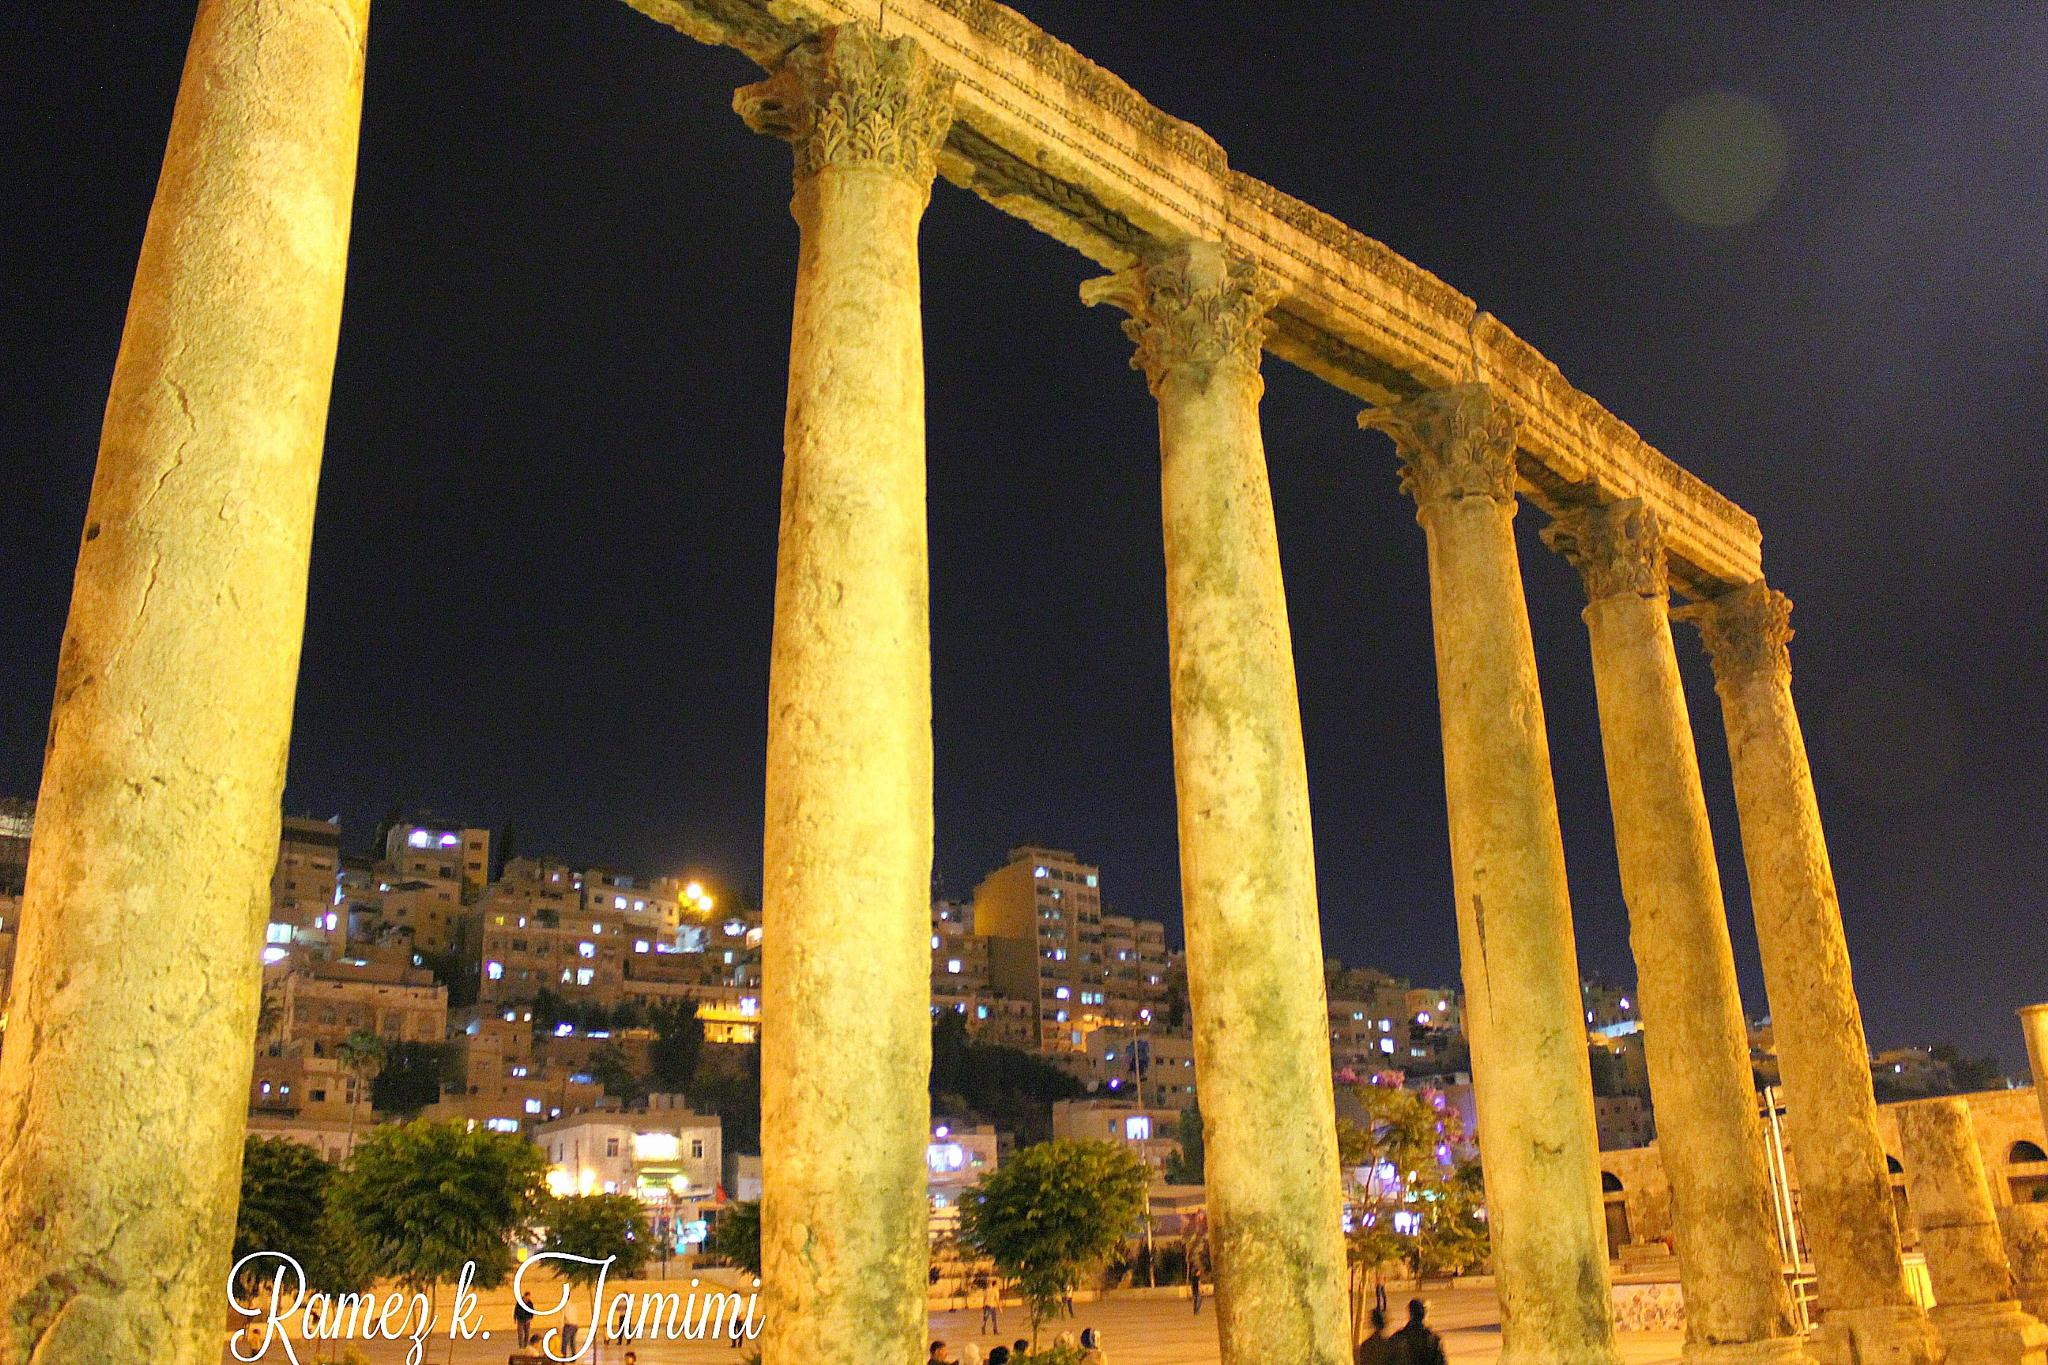 The Roman Old columns-Amman Jordan by Ramez k. Tamimi